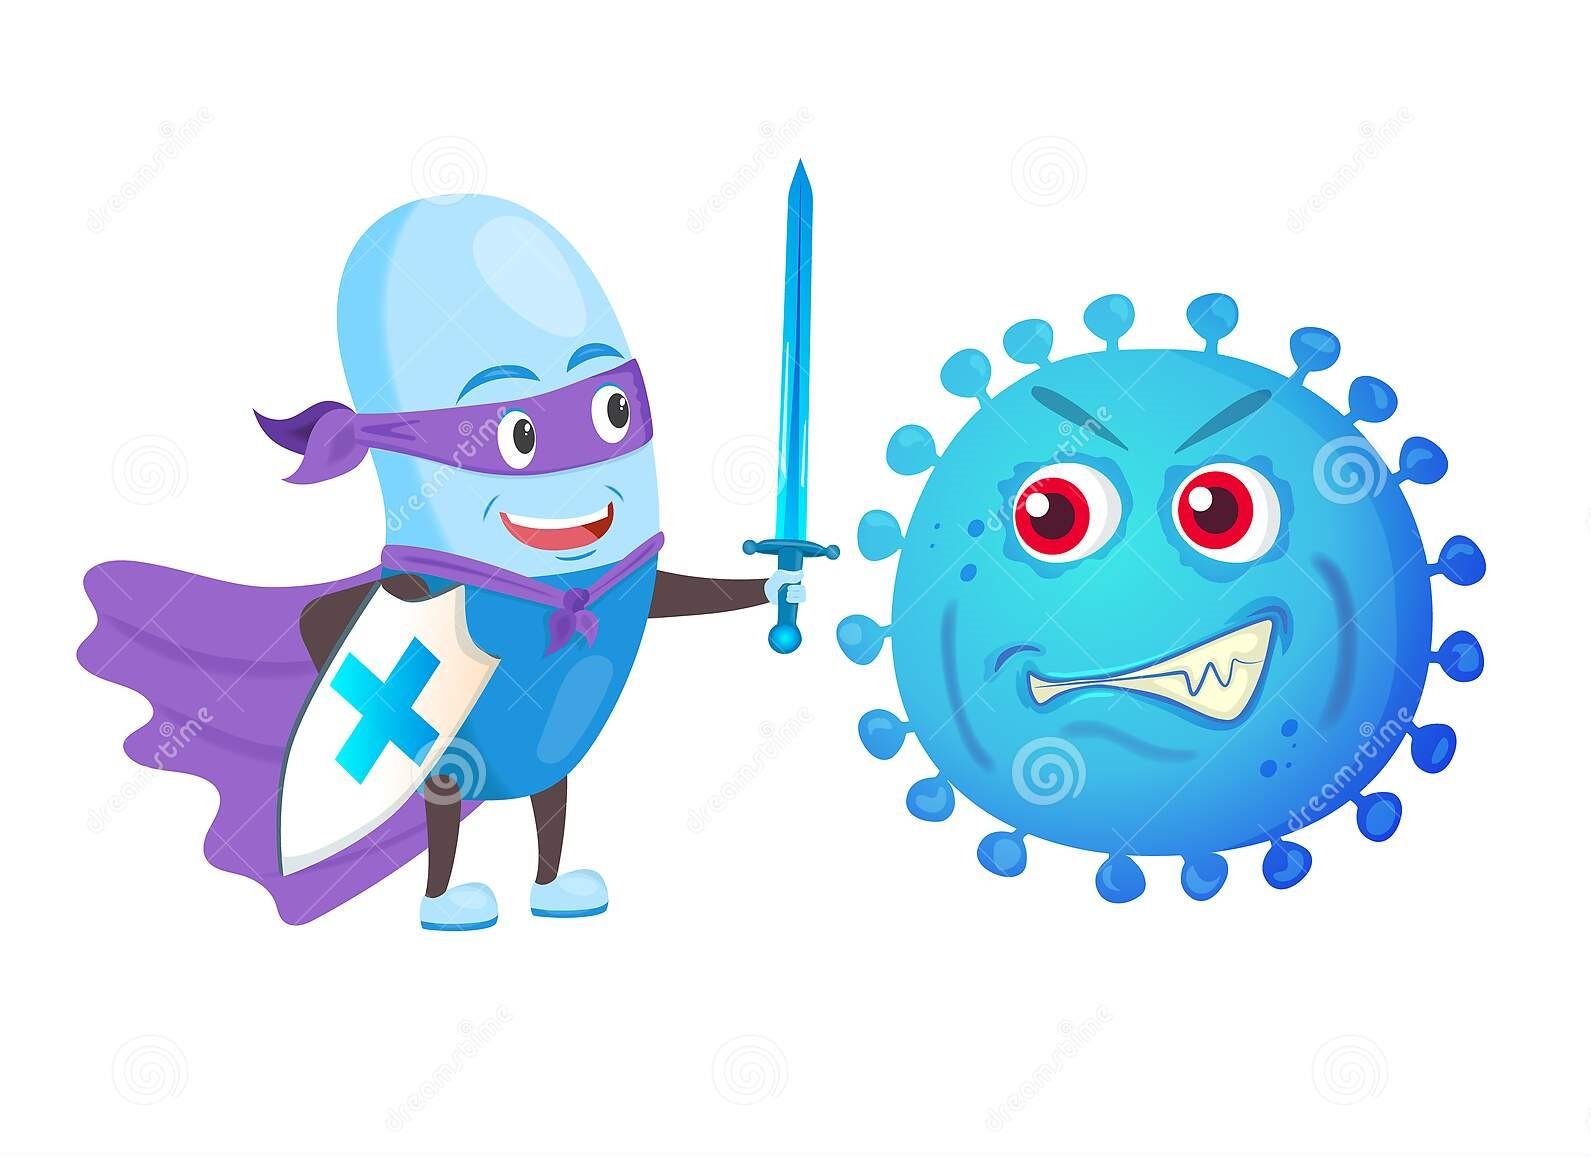 images/antibiotic2.jpg